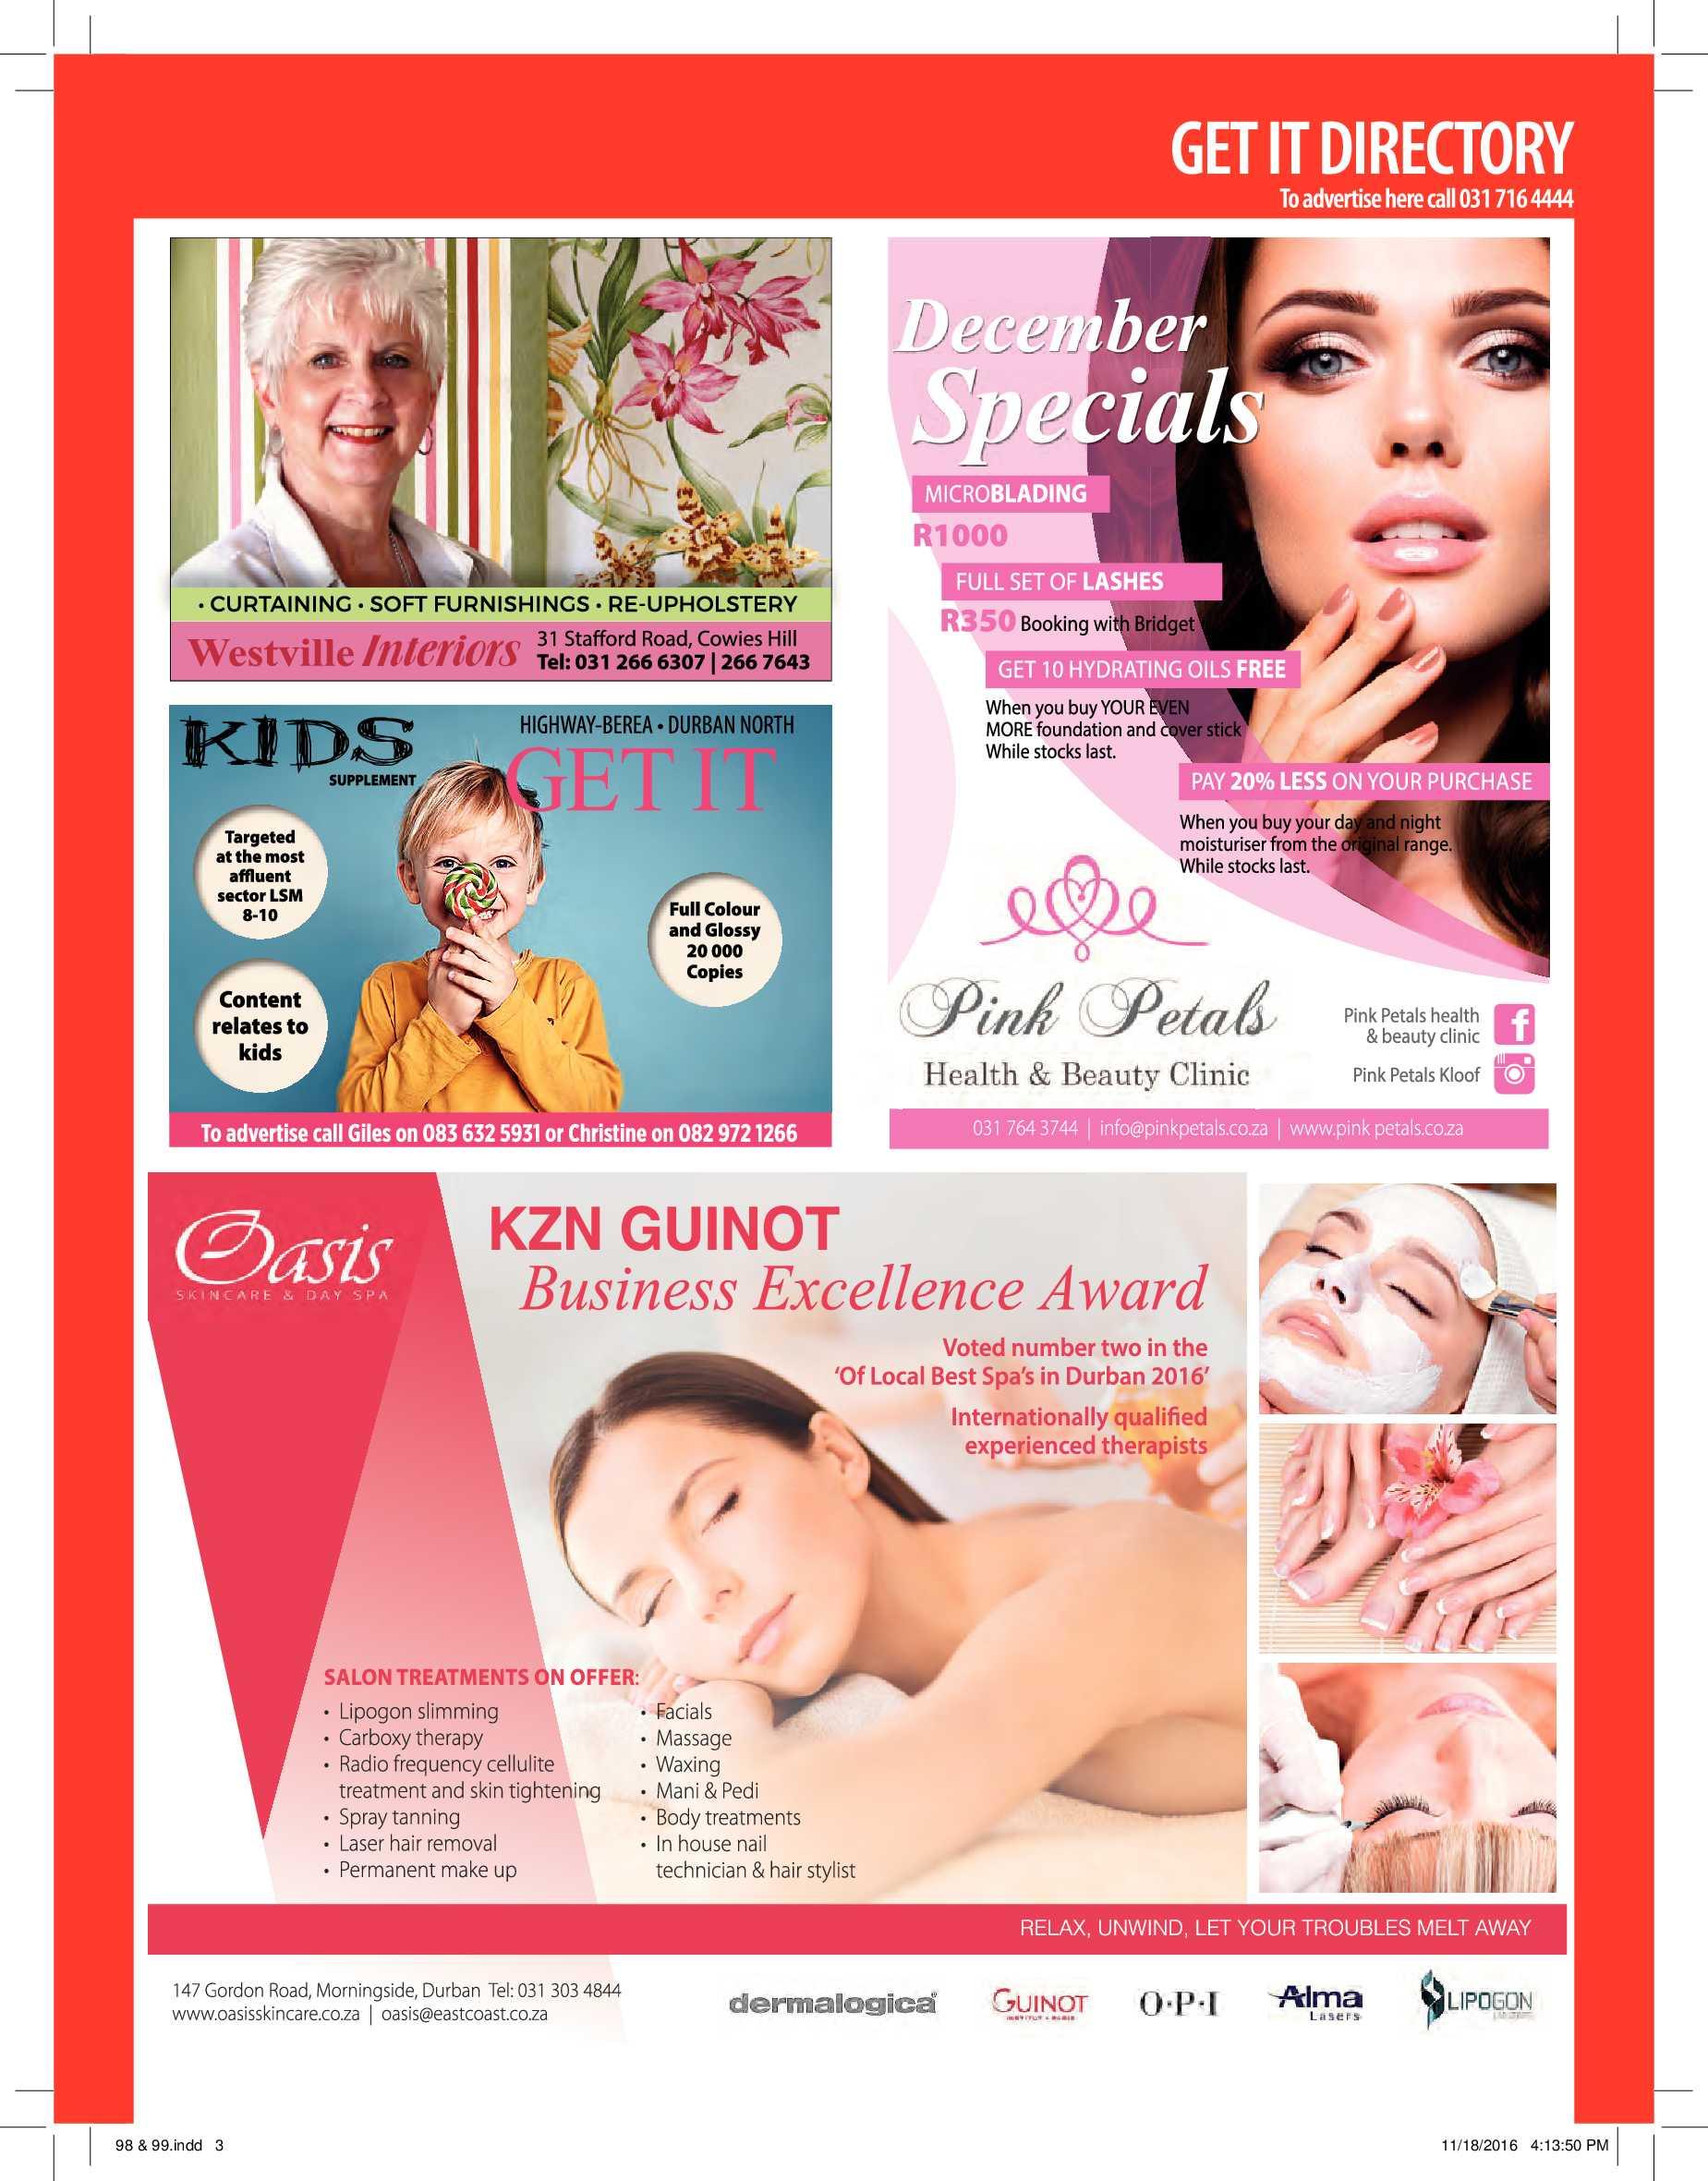 durban-get-it-magazine-december-2016-epapers-page-101